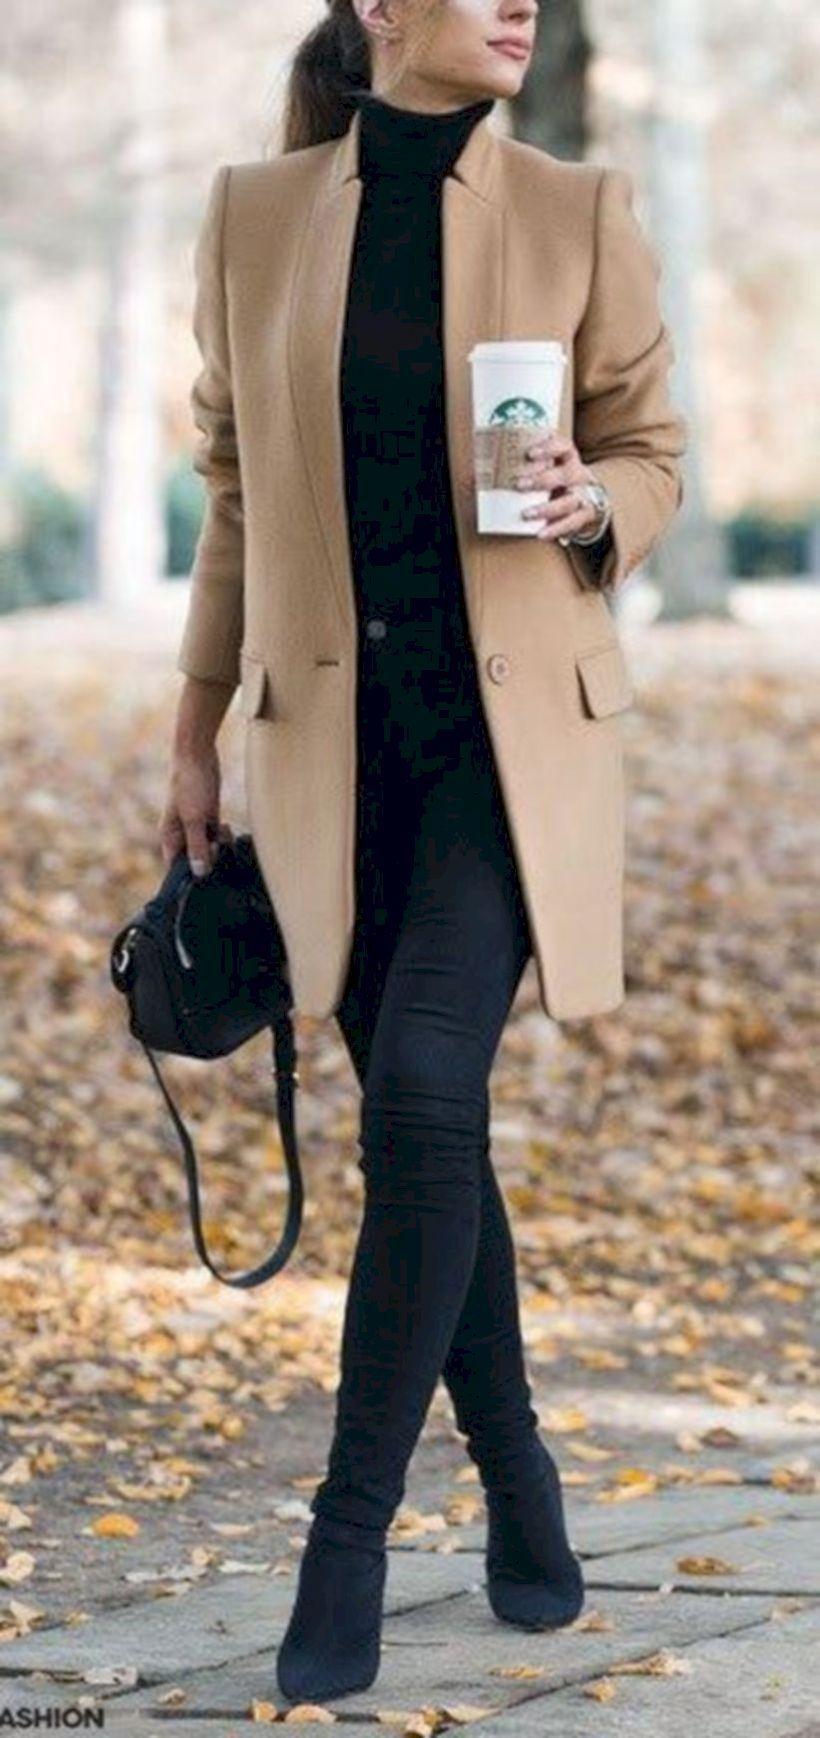 6154f754f5 63 Casual Fall Work Outfits Ideas 2018 #Fashion #Women Outfit #Women Outfit  #womensfashionprofessional. 28 Cute ...